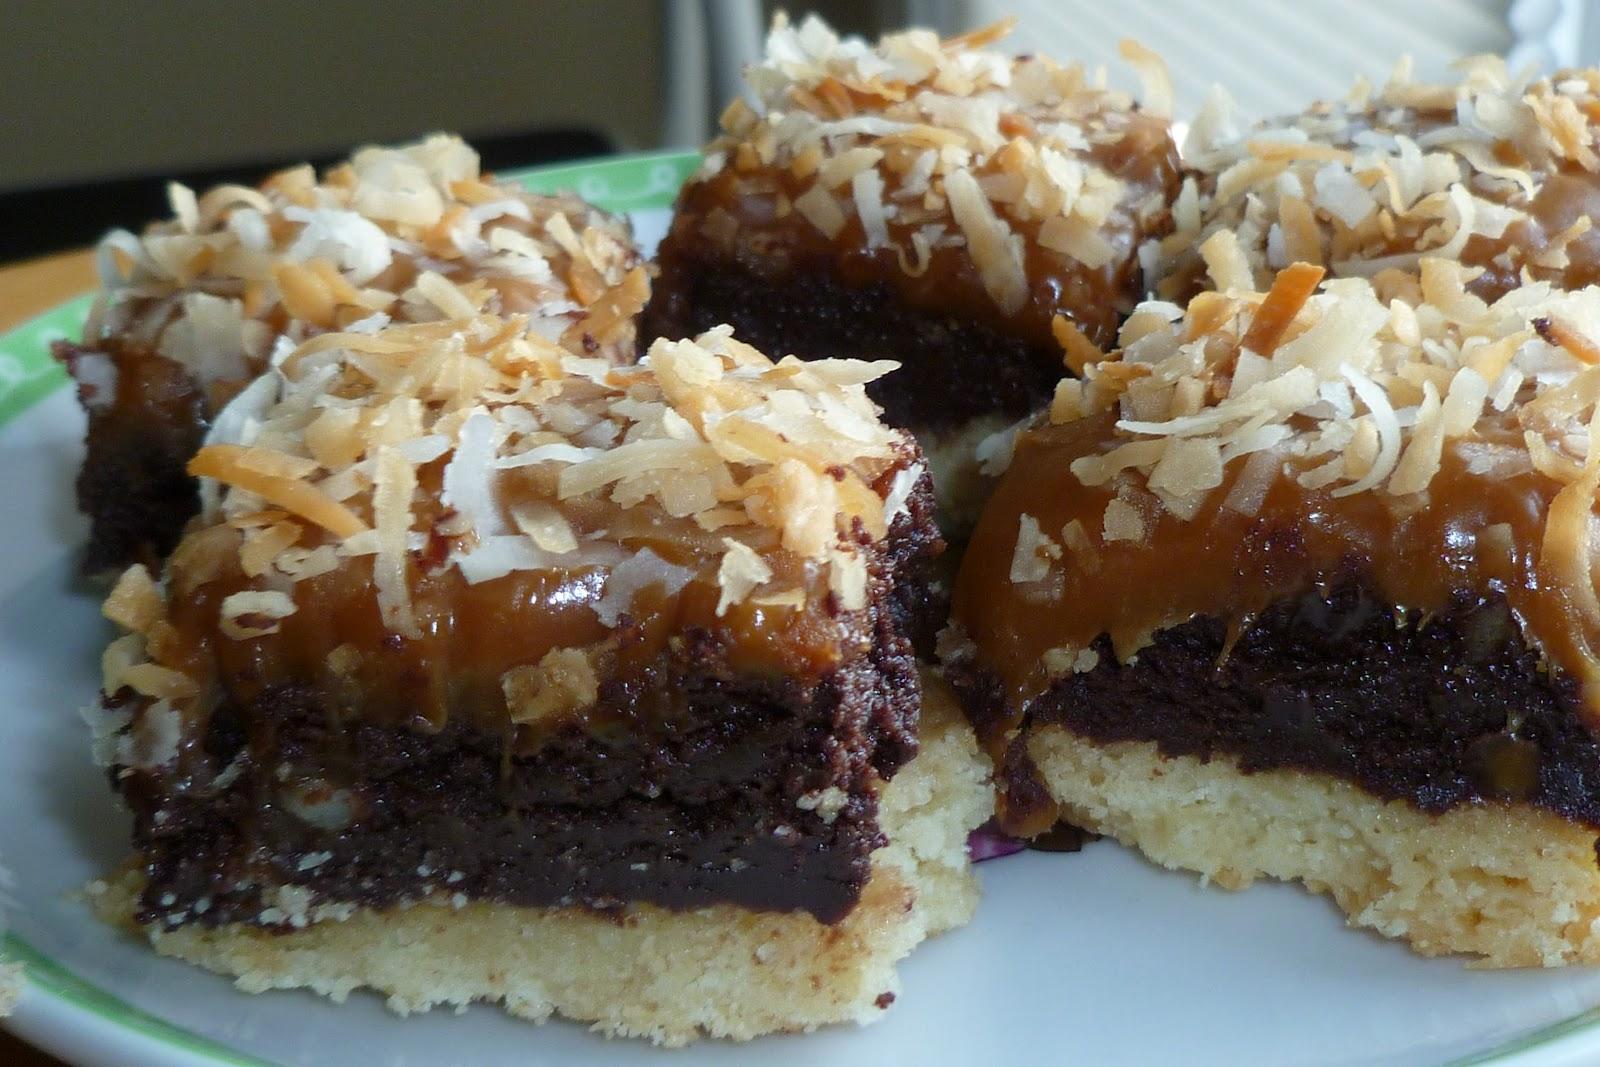 The Pastry Chef's Baking: Homemade Samoas